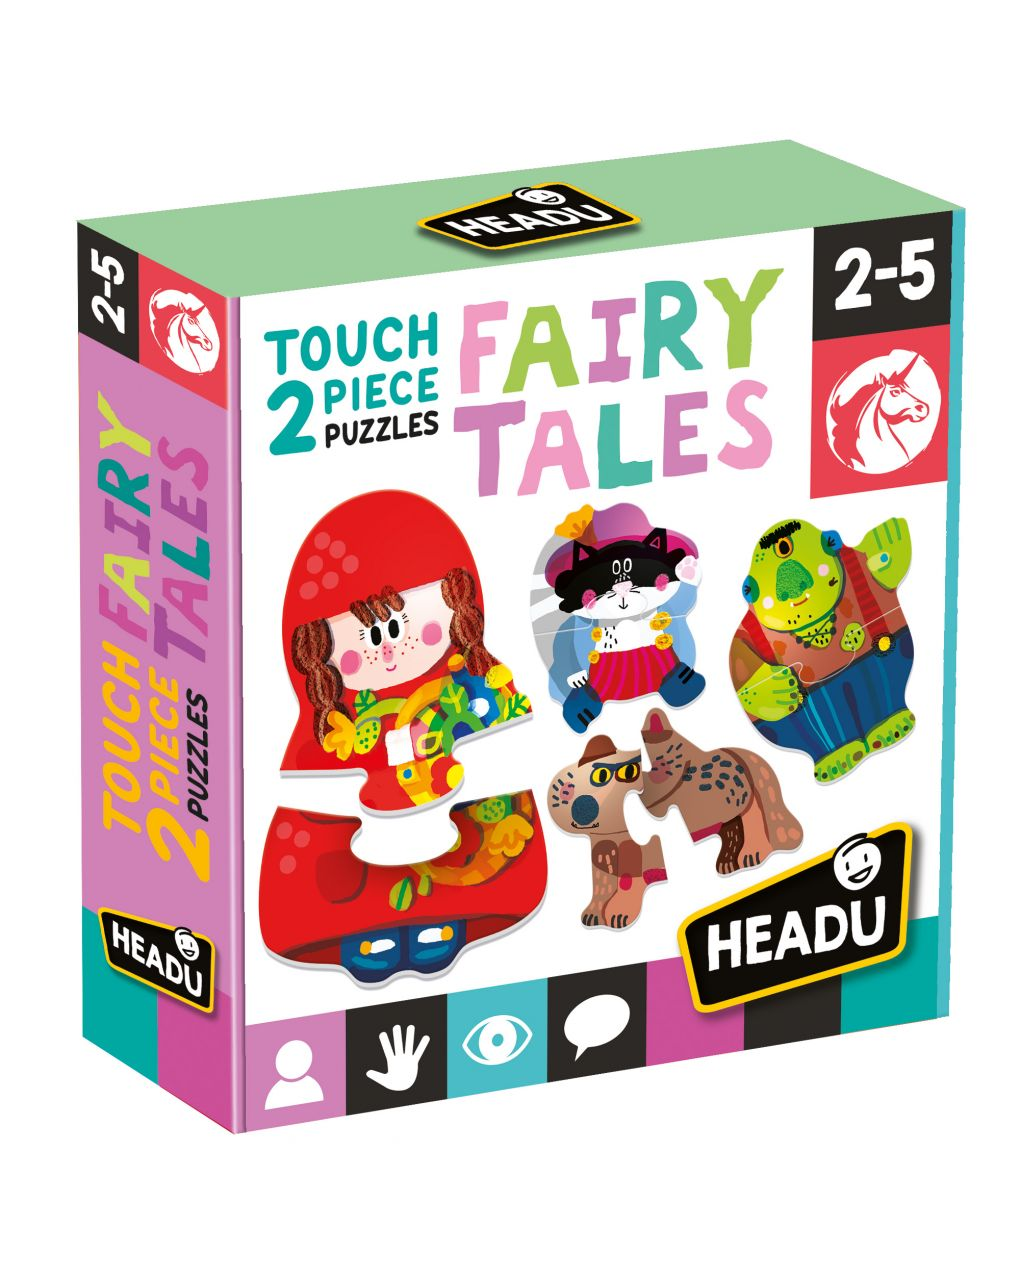 Headu - 2 pieces touch puzzle fairy tales - Headu